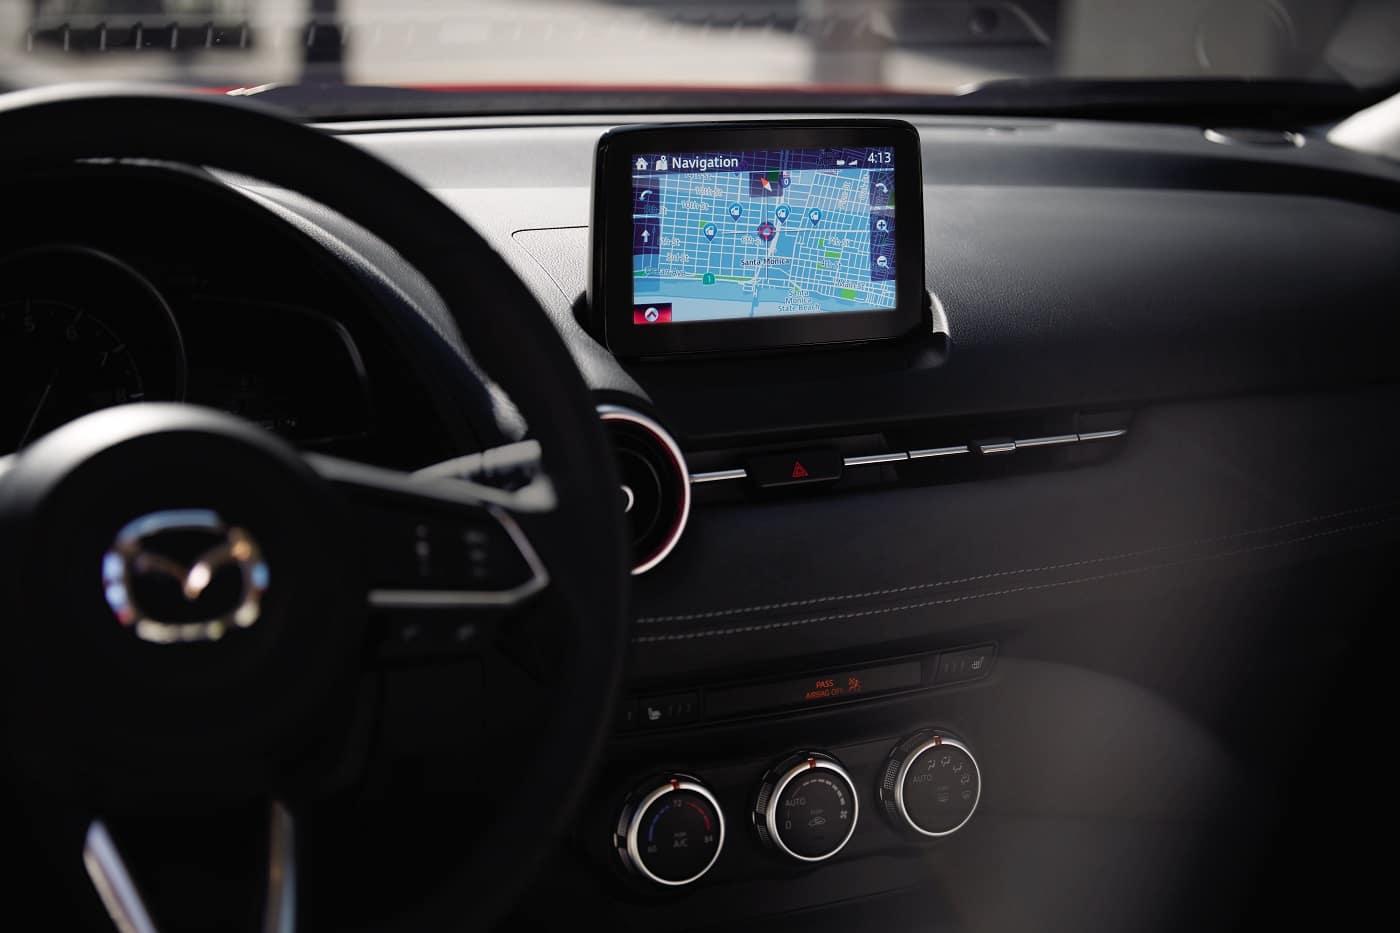 2020 Mazda CX-3 Interior Technology